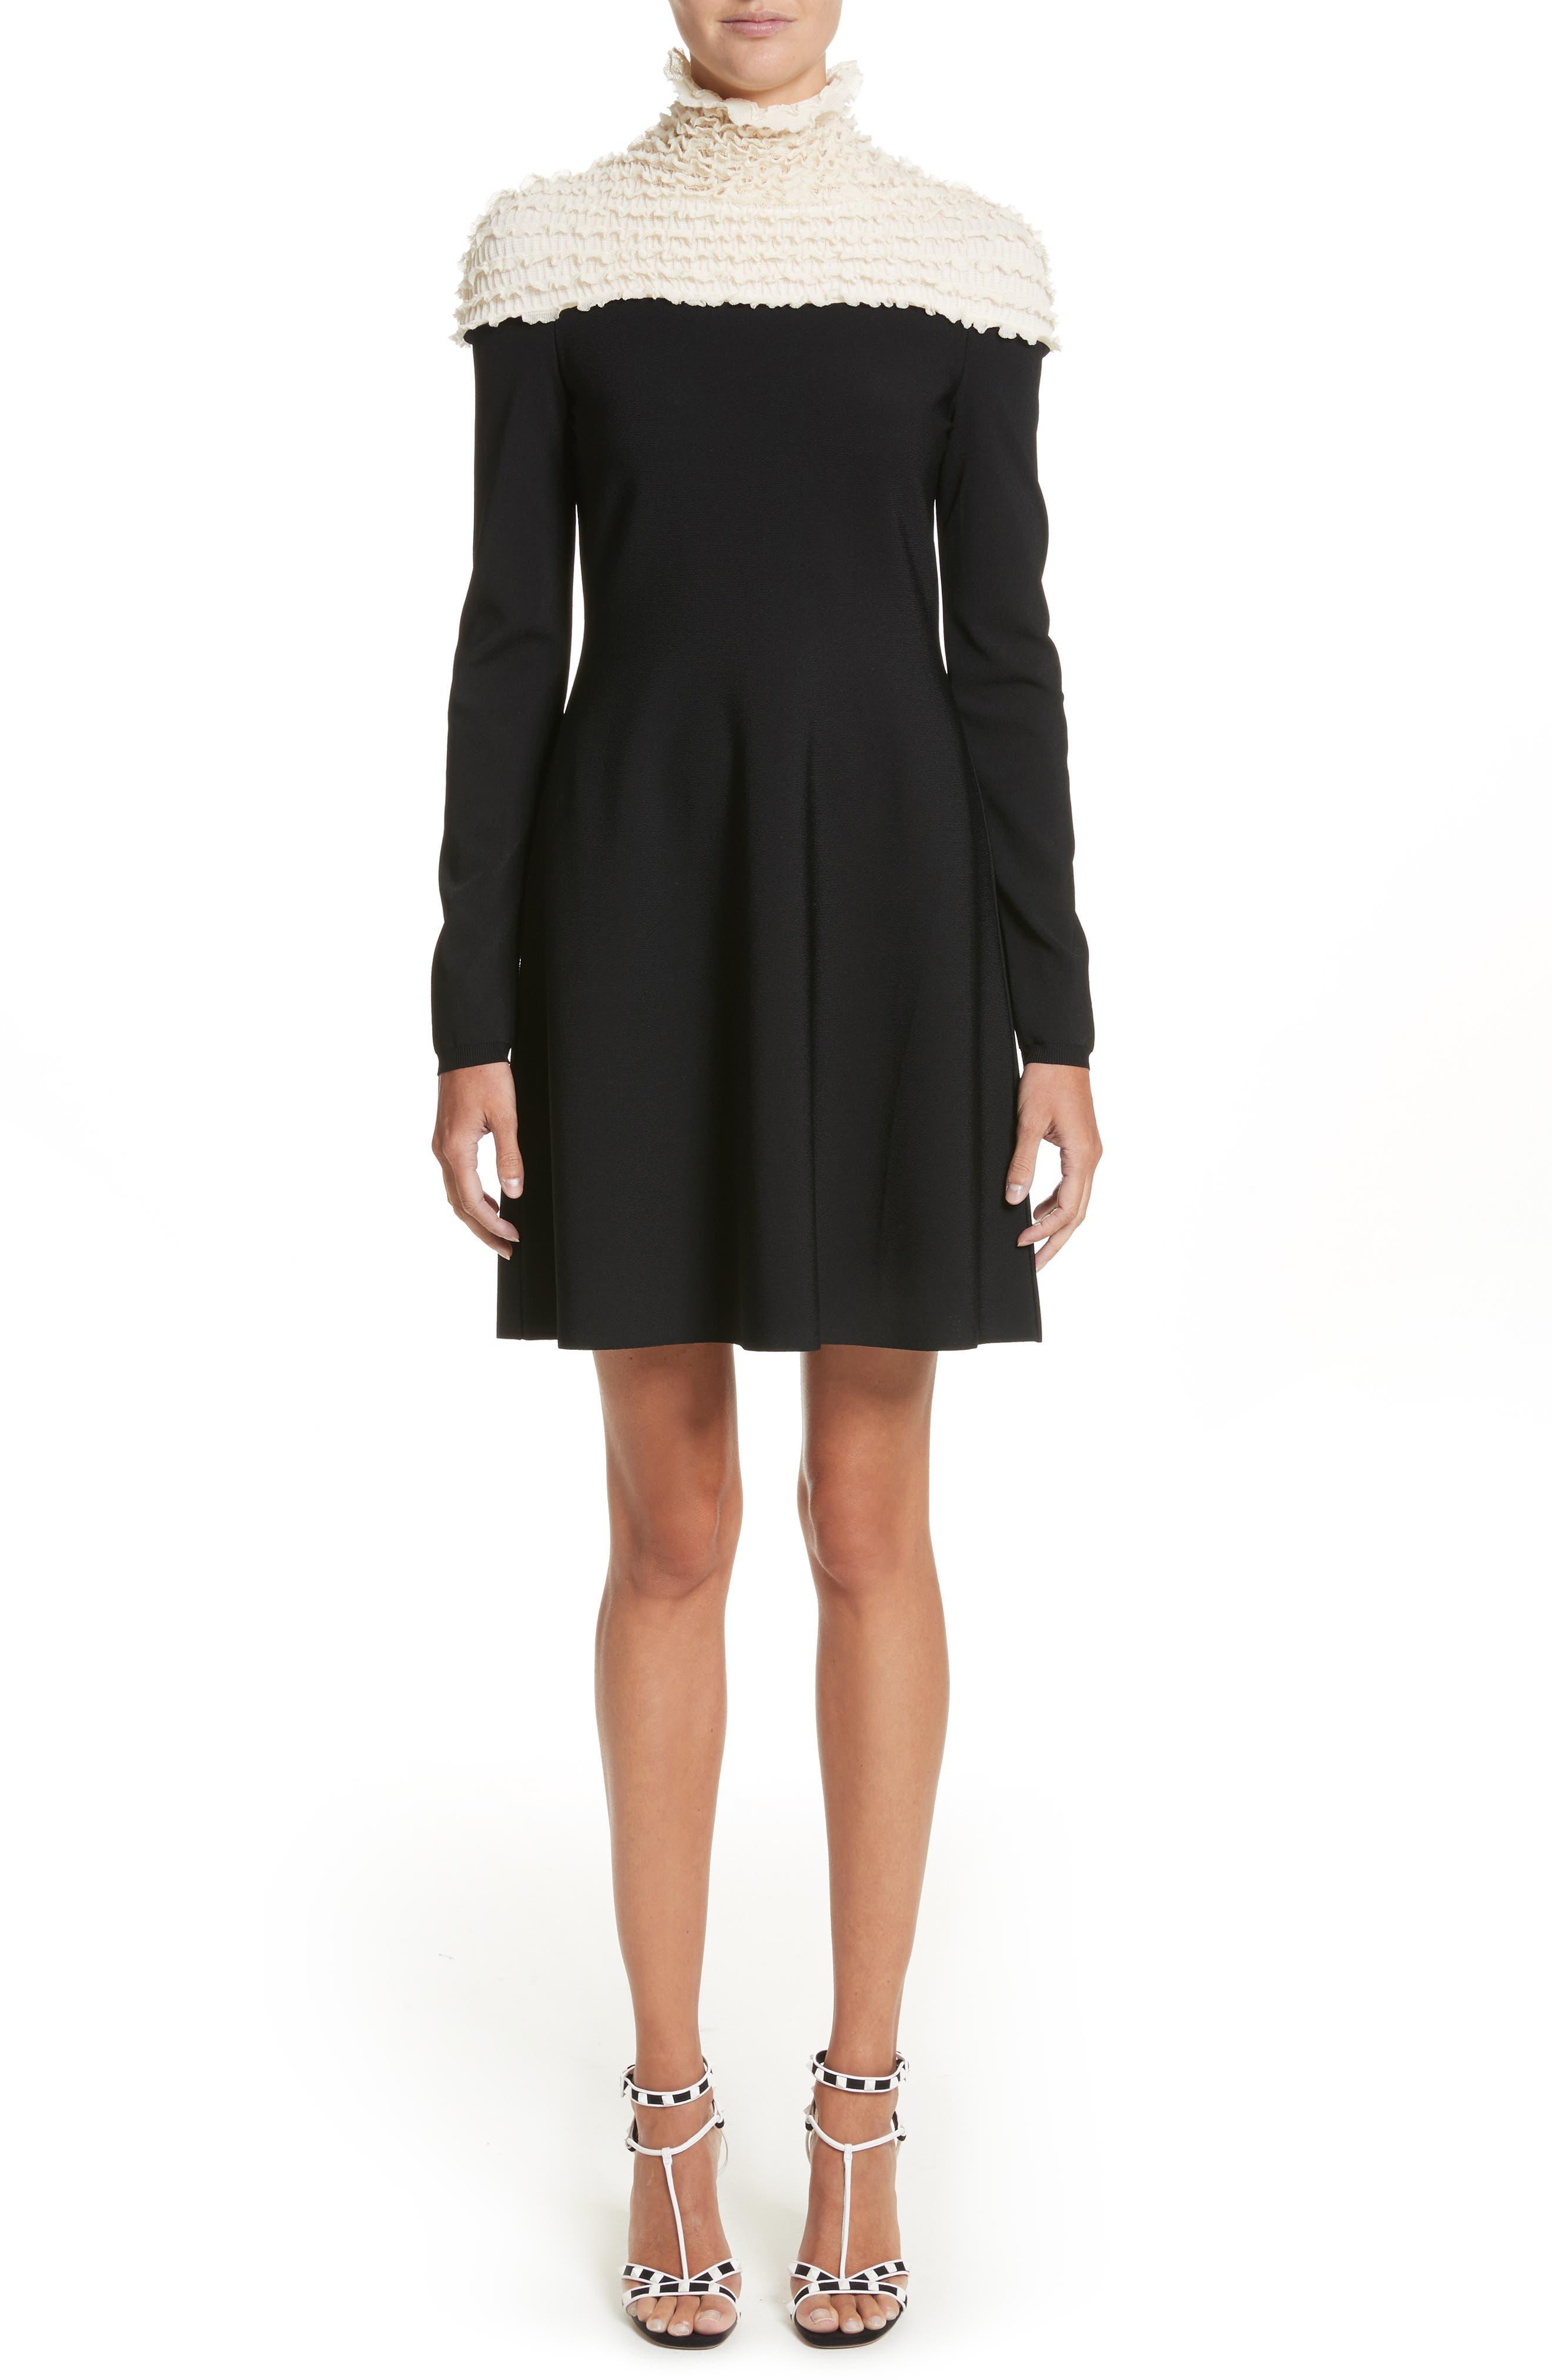 Ruffle Neckline Knit Dress,                             Main thumbnail 1, color,                             Black/ Ivory